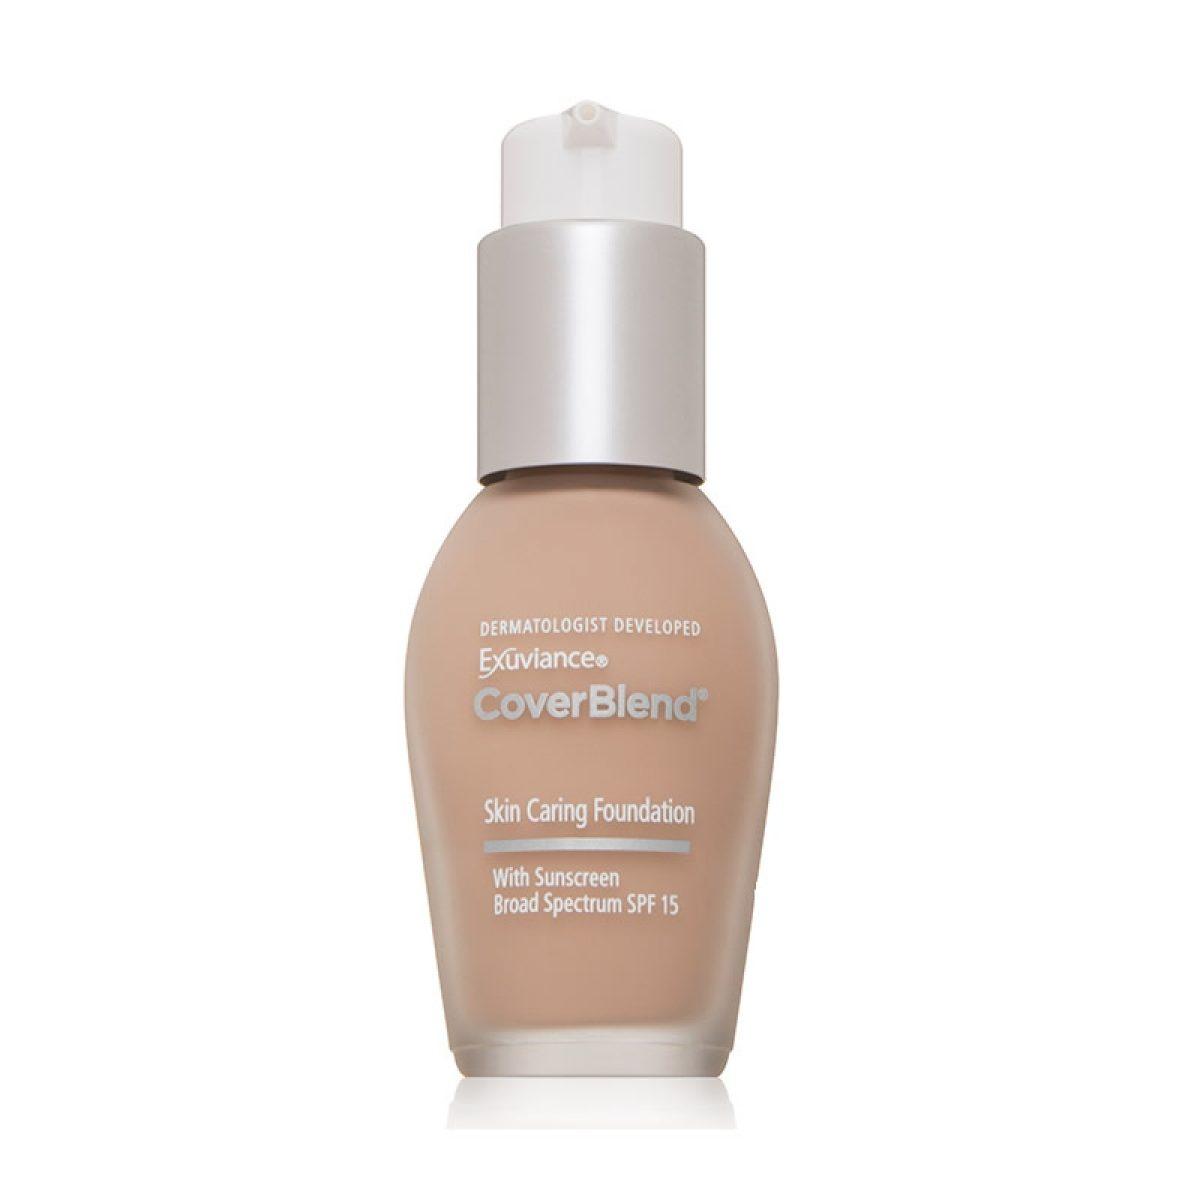 Skin Caring Foundation SPF 15